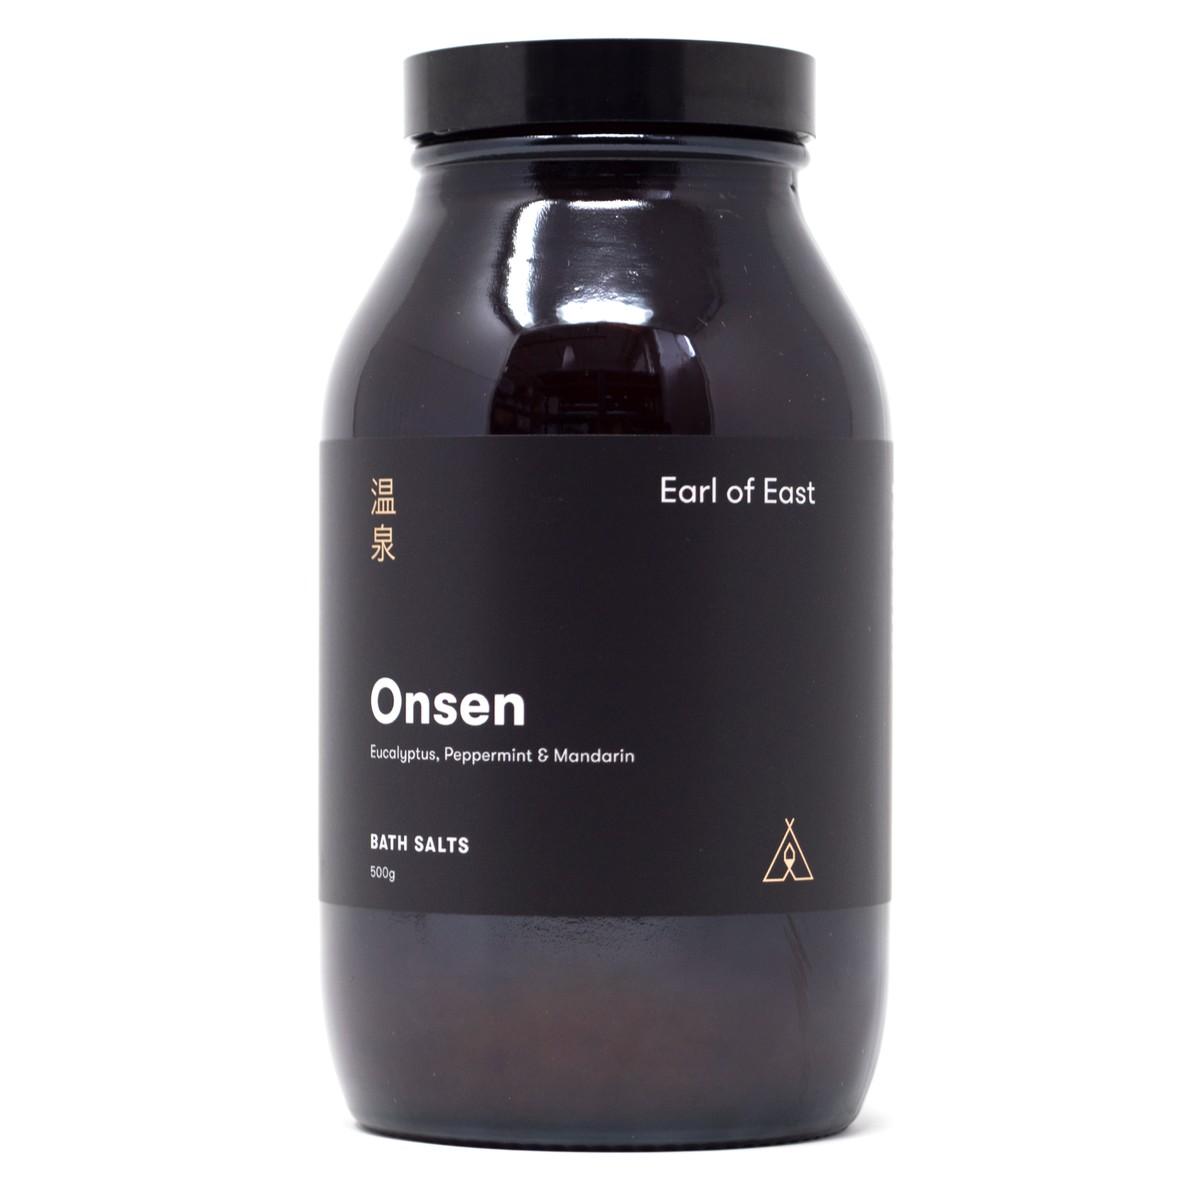 Photo of Onsen Bath Salts